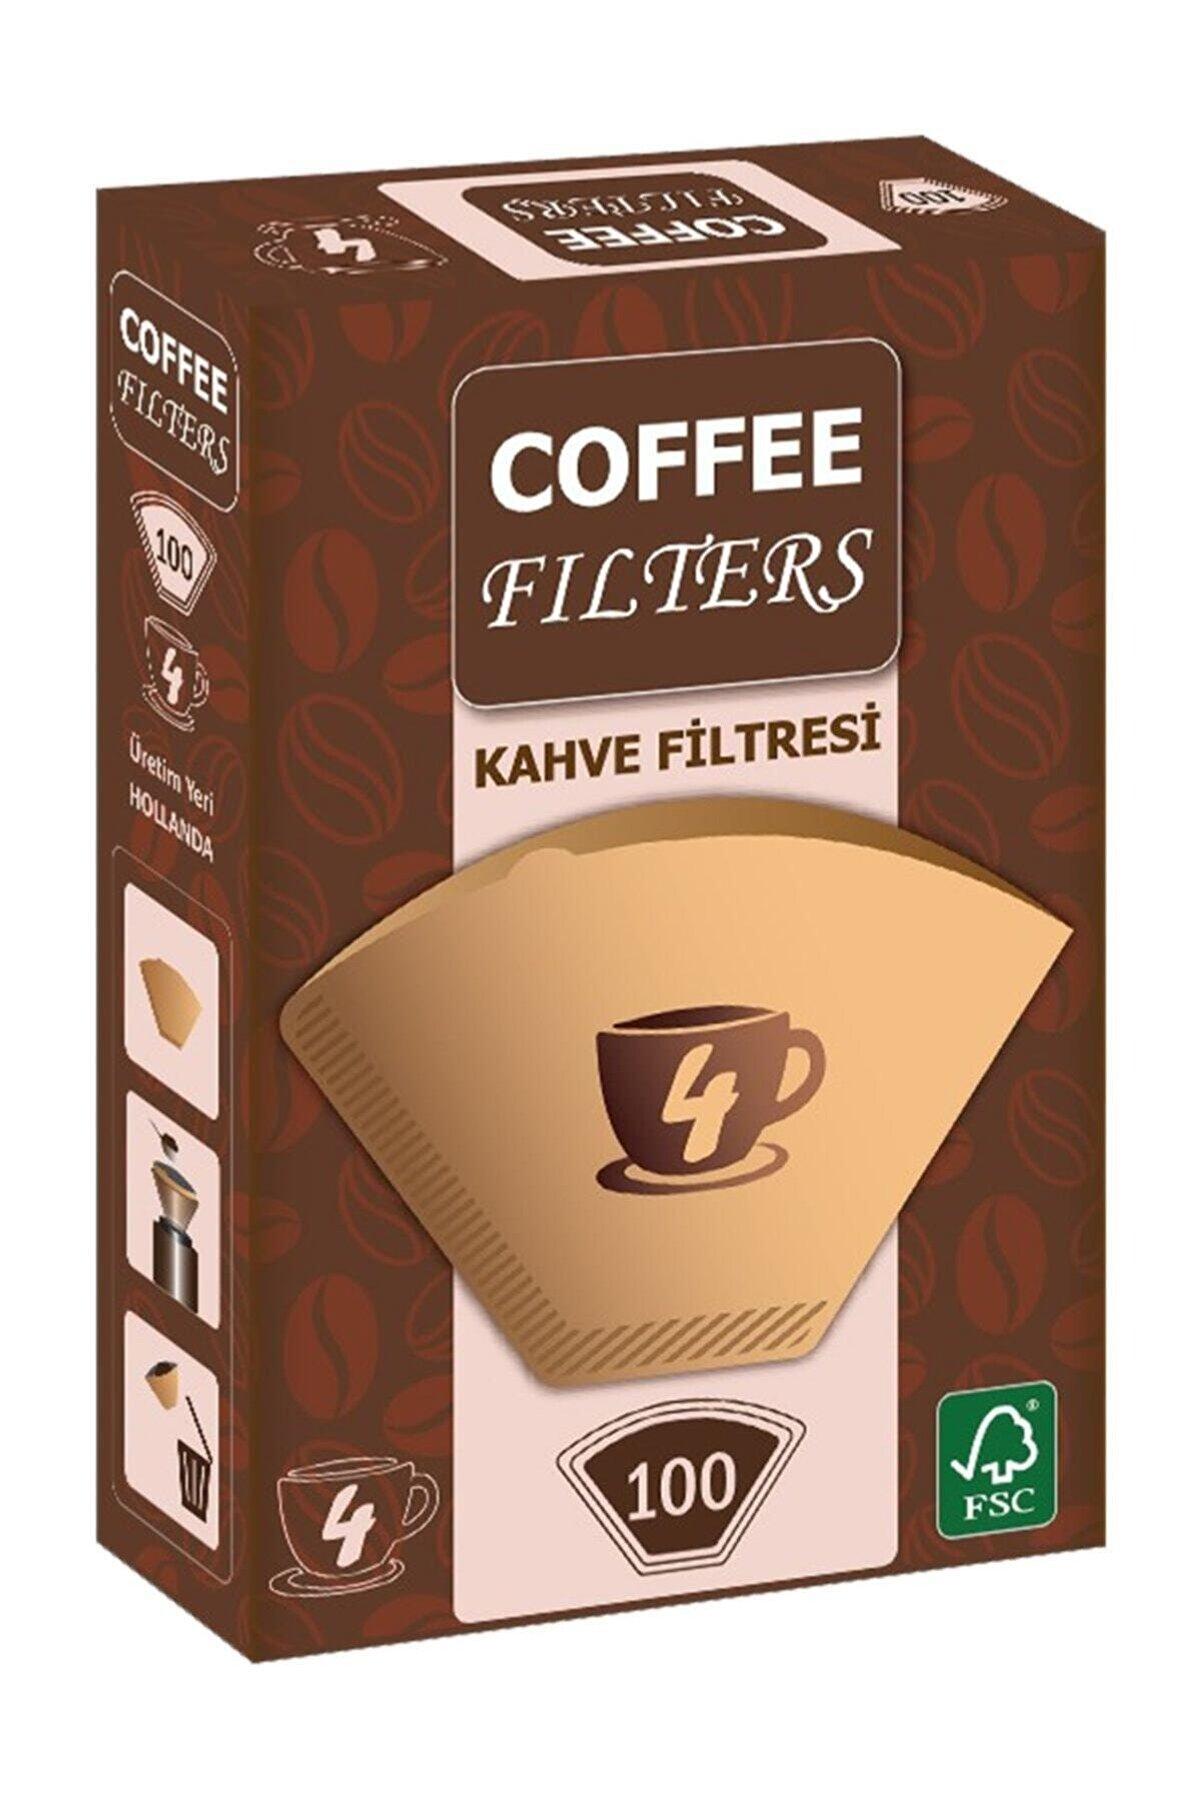 Universal Coffee Filters Filtre Kahve Kağıdı 1/4 4 Numara 100'lü Paket